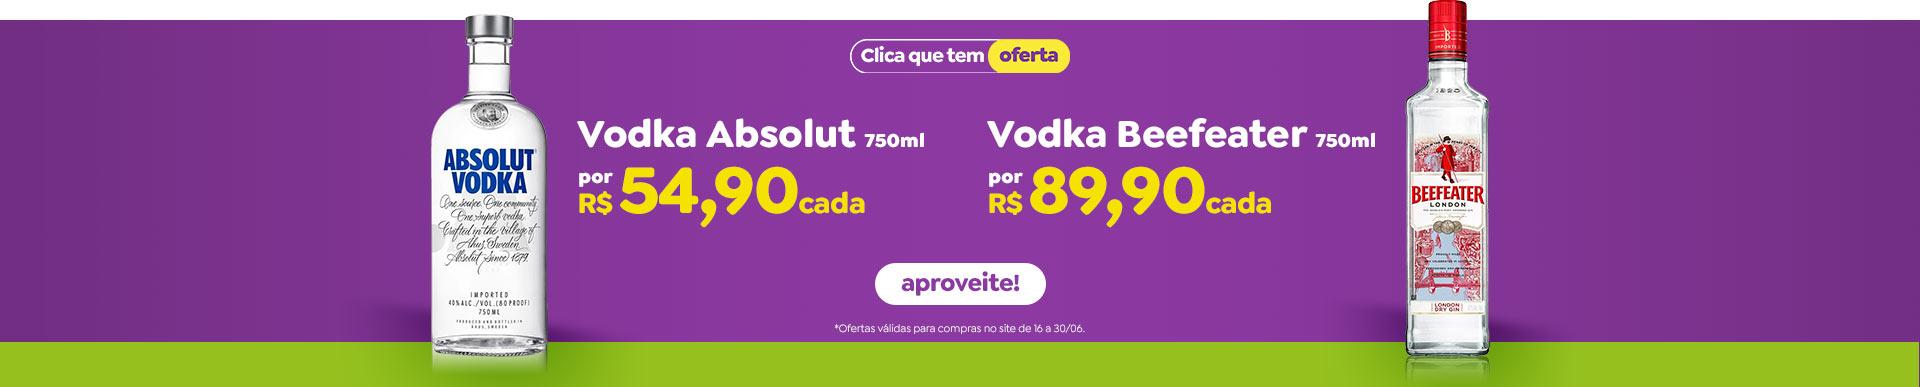 amk_2021-06-16a06-30_perene_mercearia_vodka-df